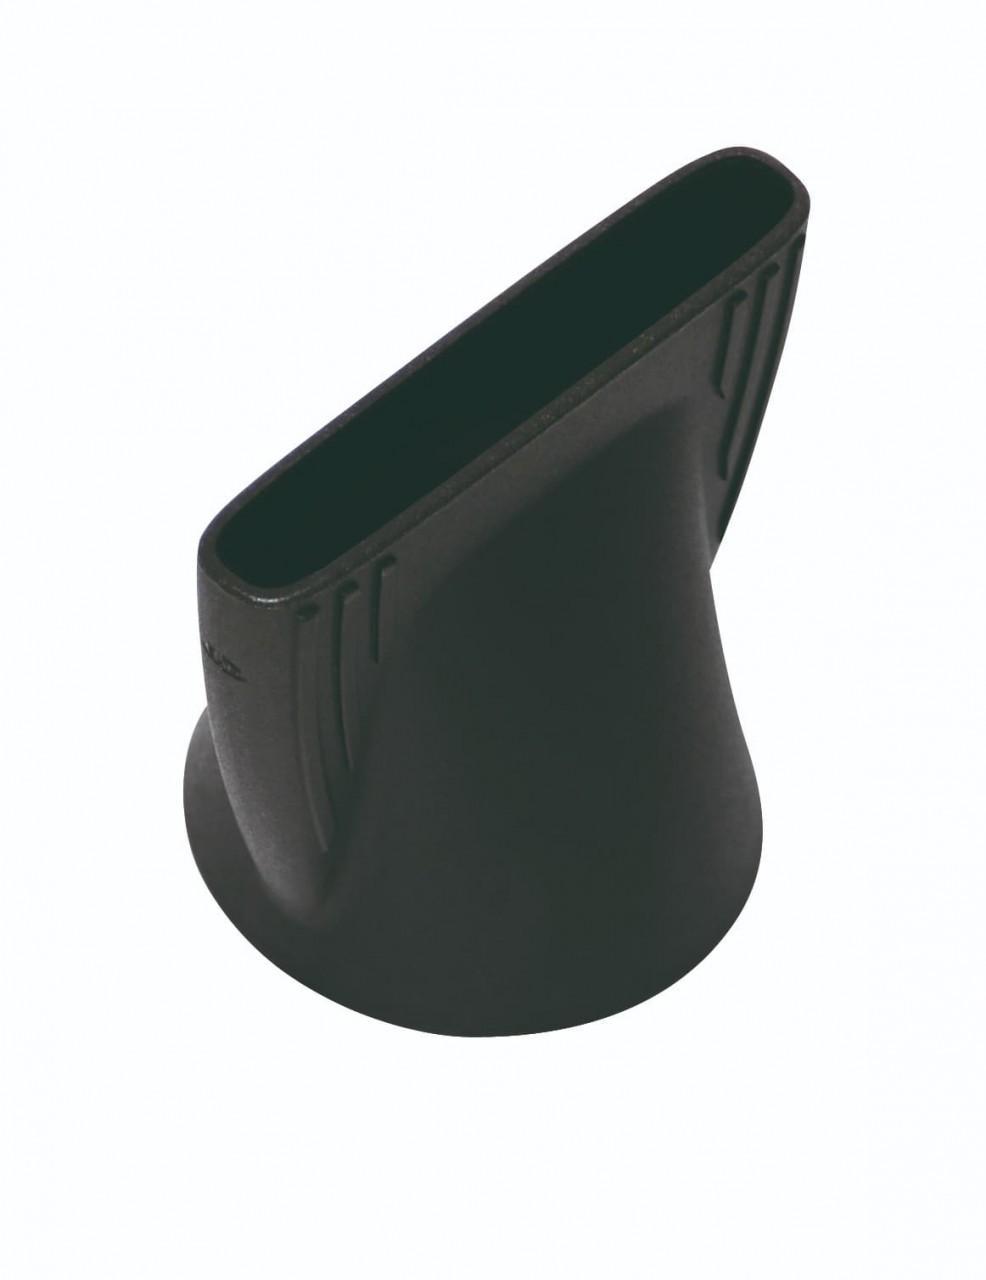 Luftdüse für Haartrockner JAGUAR HD Boost